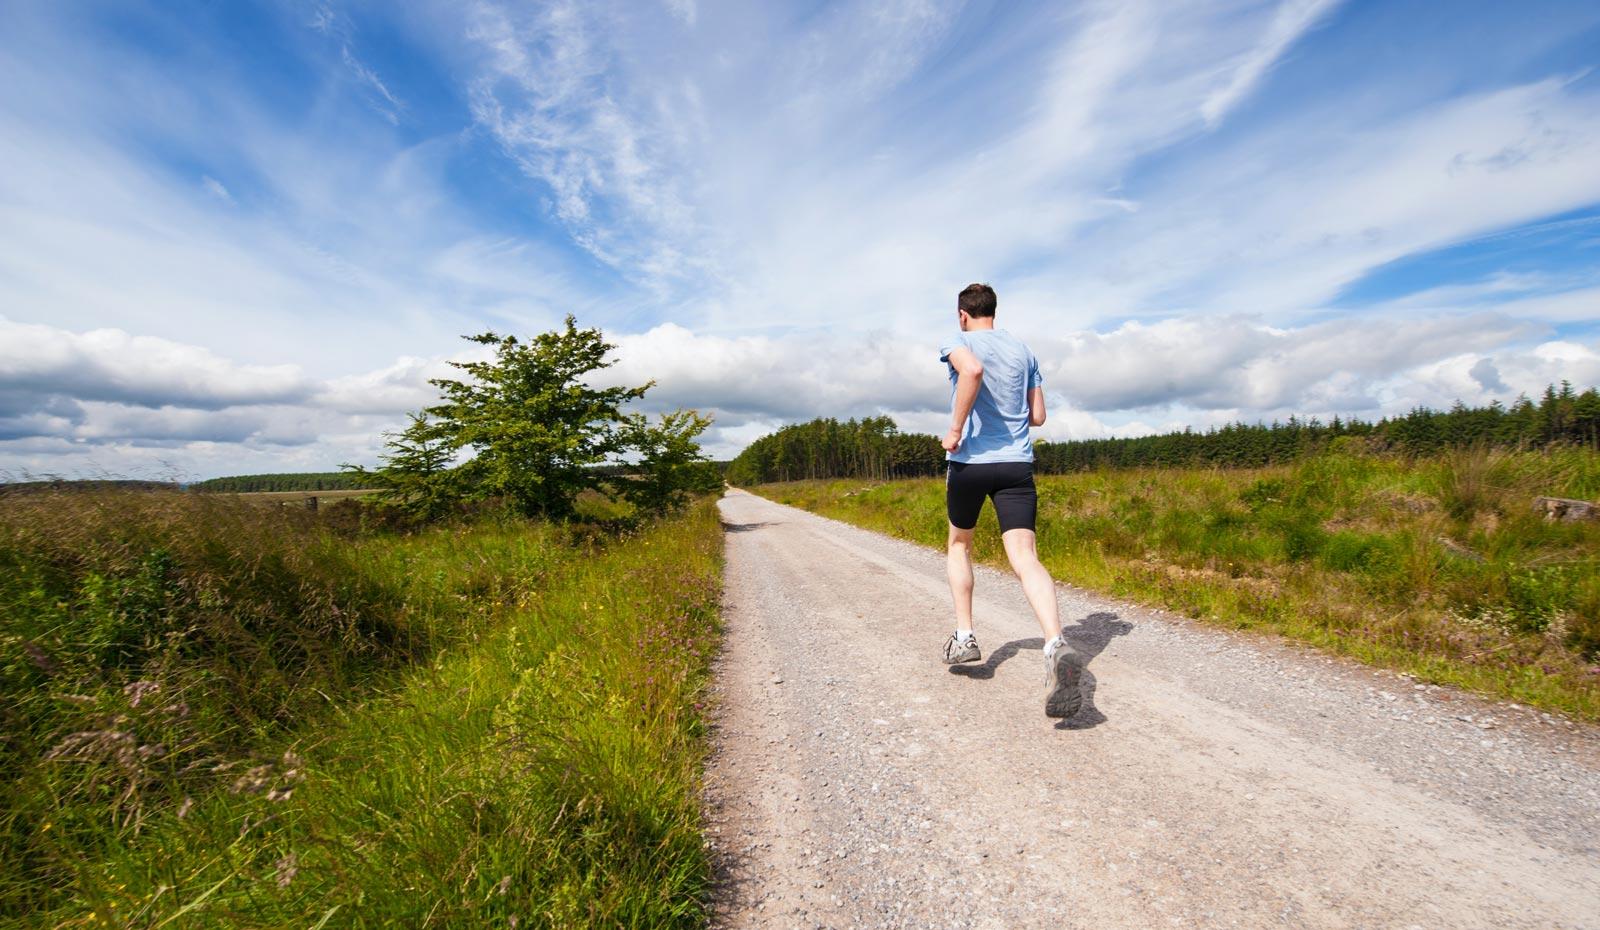 Man running through farm field